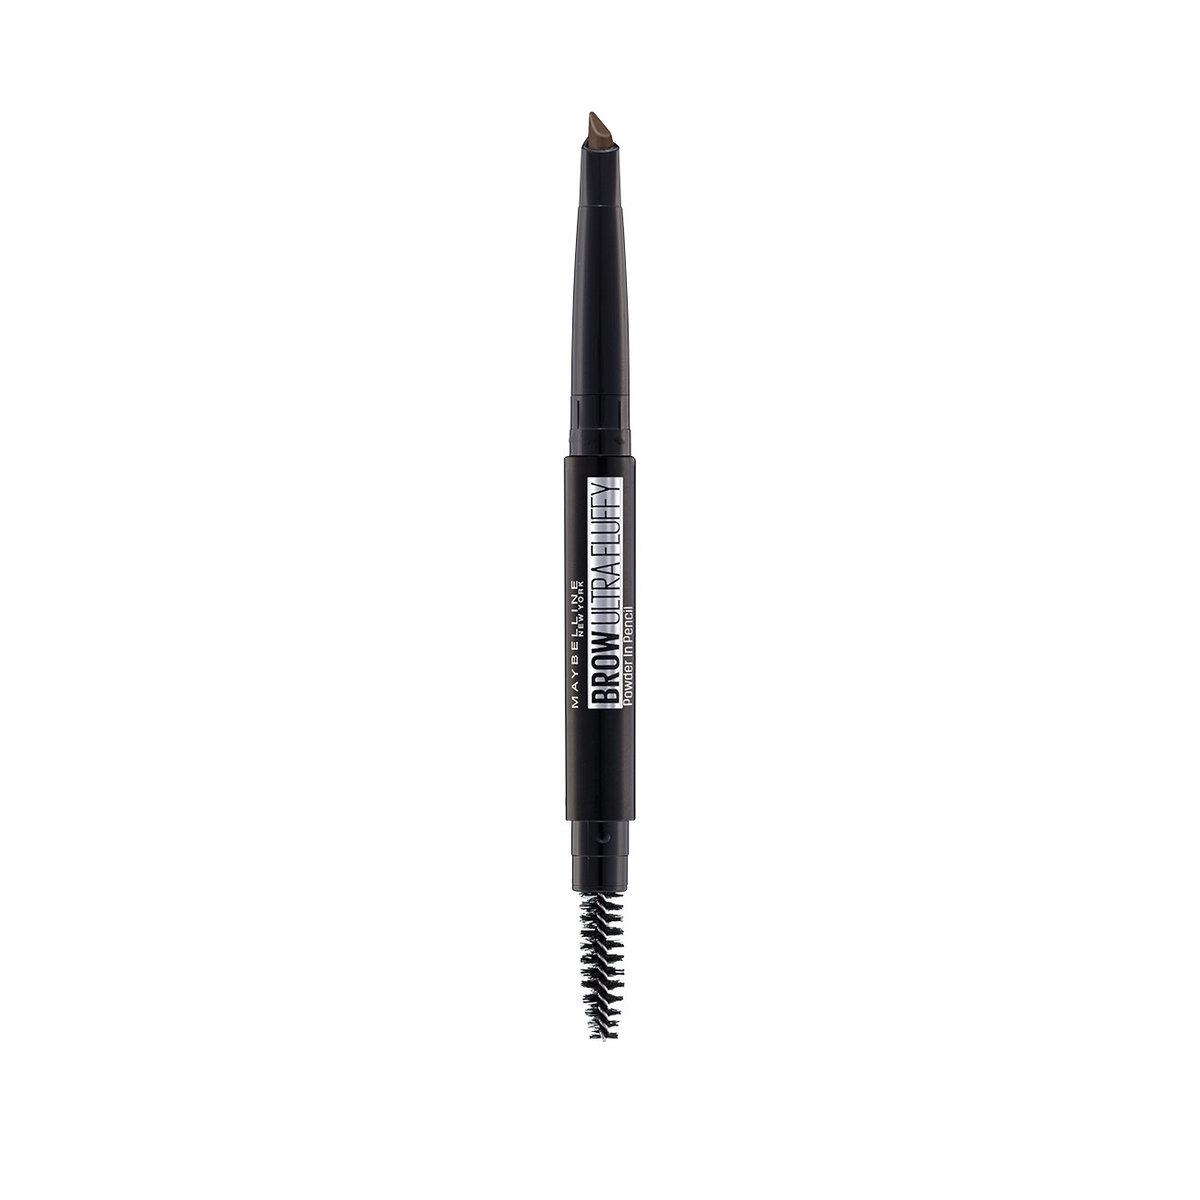 Brow Ultra Fluffy Powder in Pencil Br1 Dark Brown